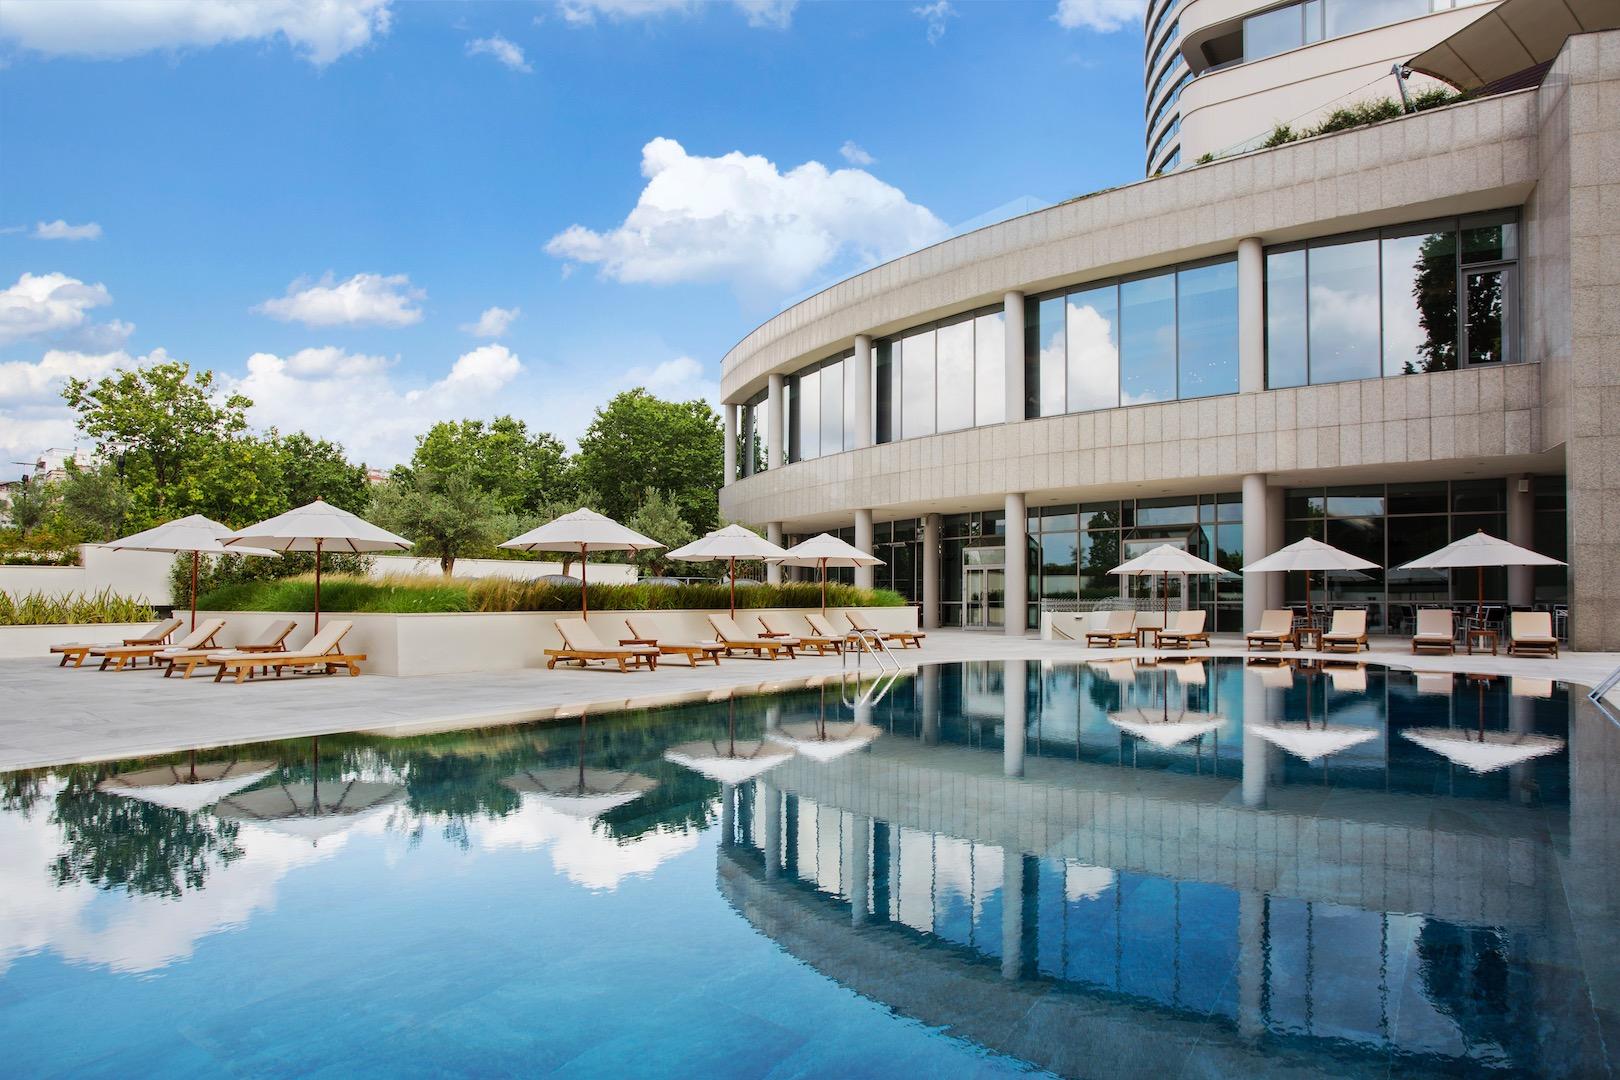 ext_opt_Conrad-Istanbul-Pool-02.jpg